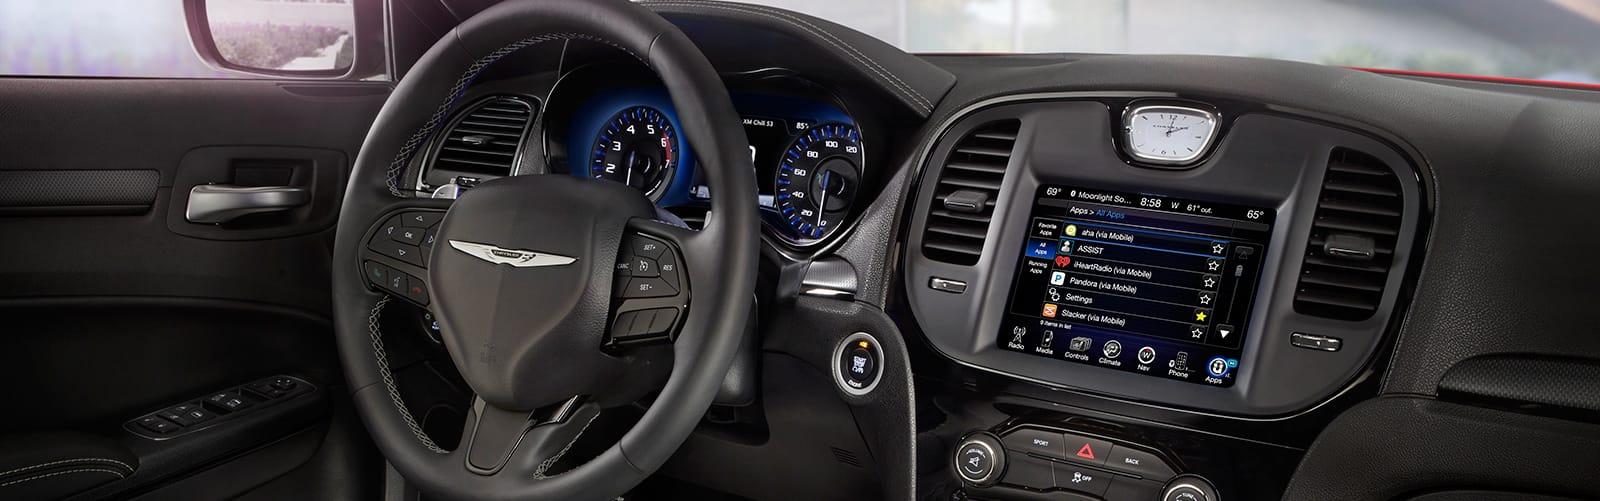 2016 Chrysler 300 - Bold All-Wheel Drive Sedan